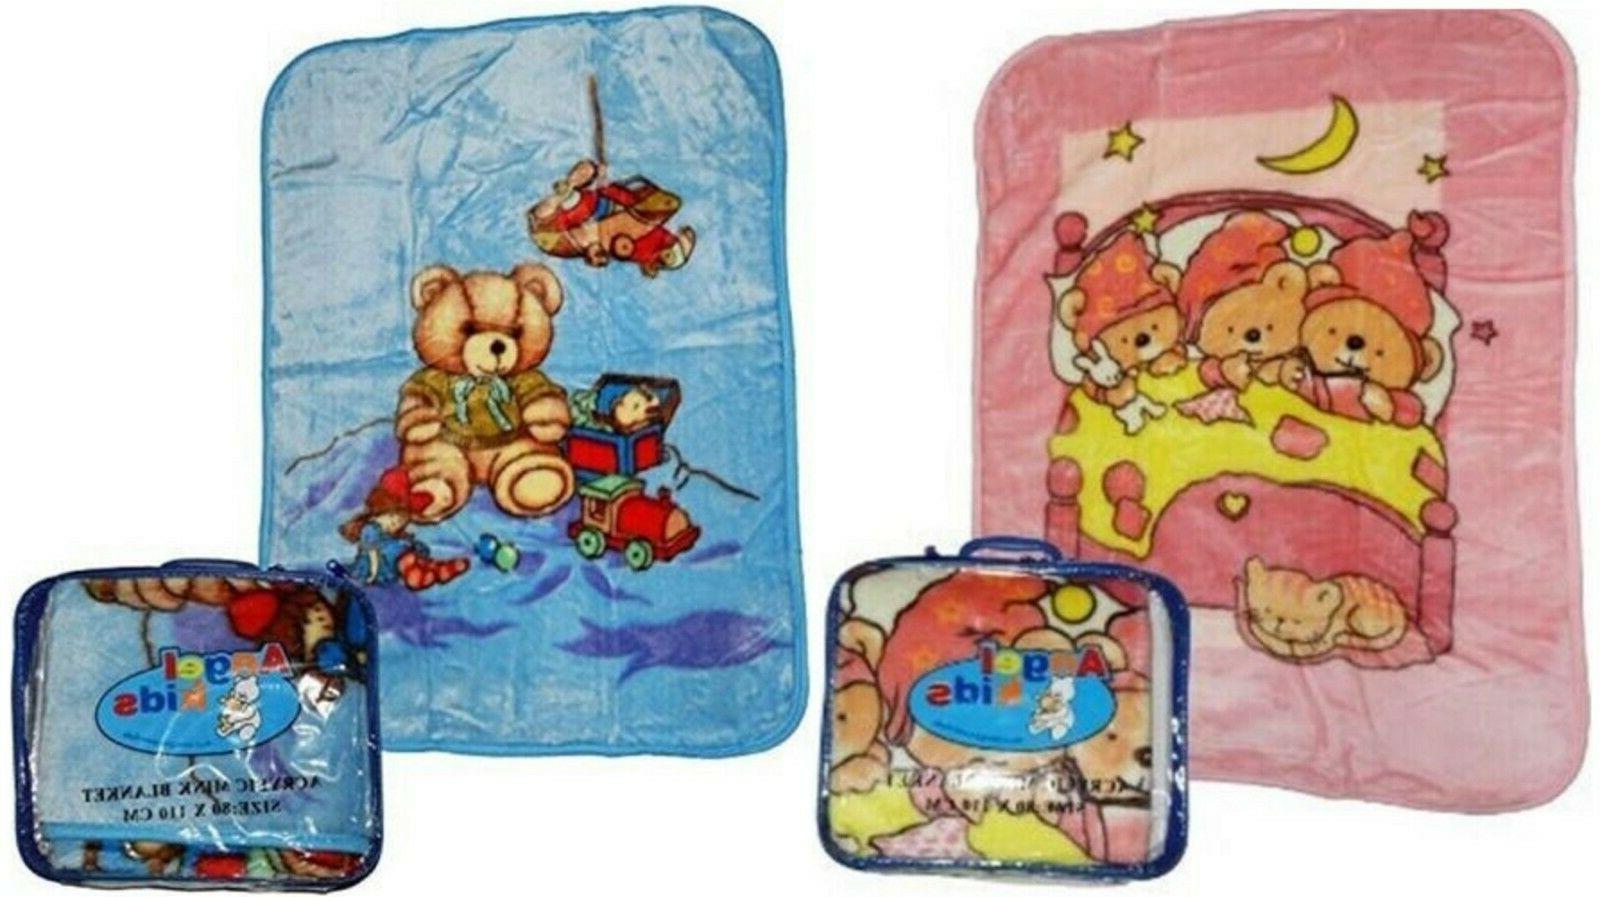 soft baby newborn toddler blanket pram crib